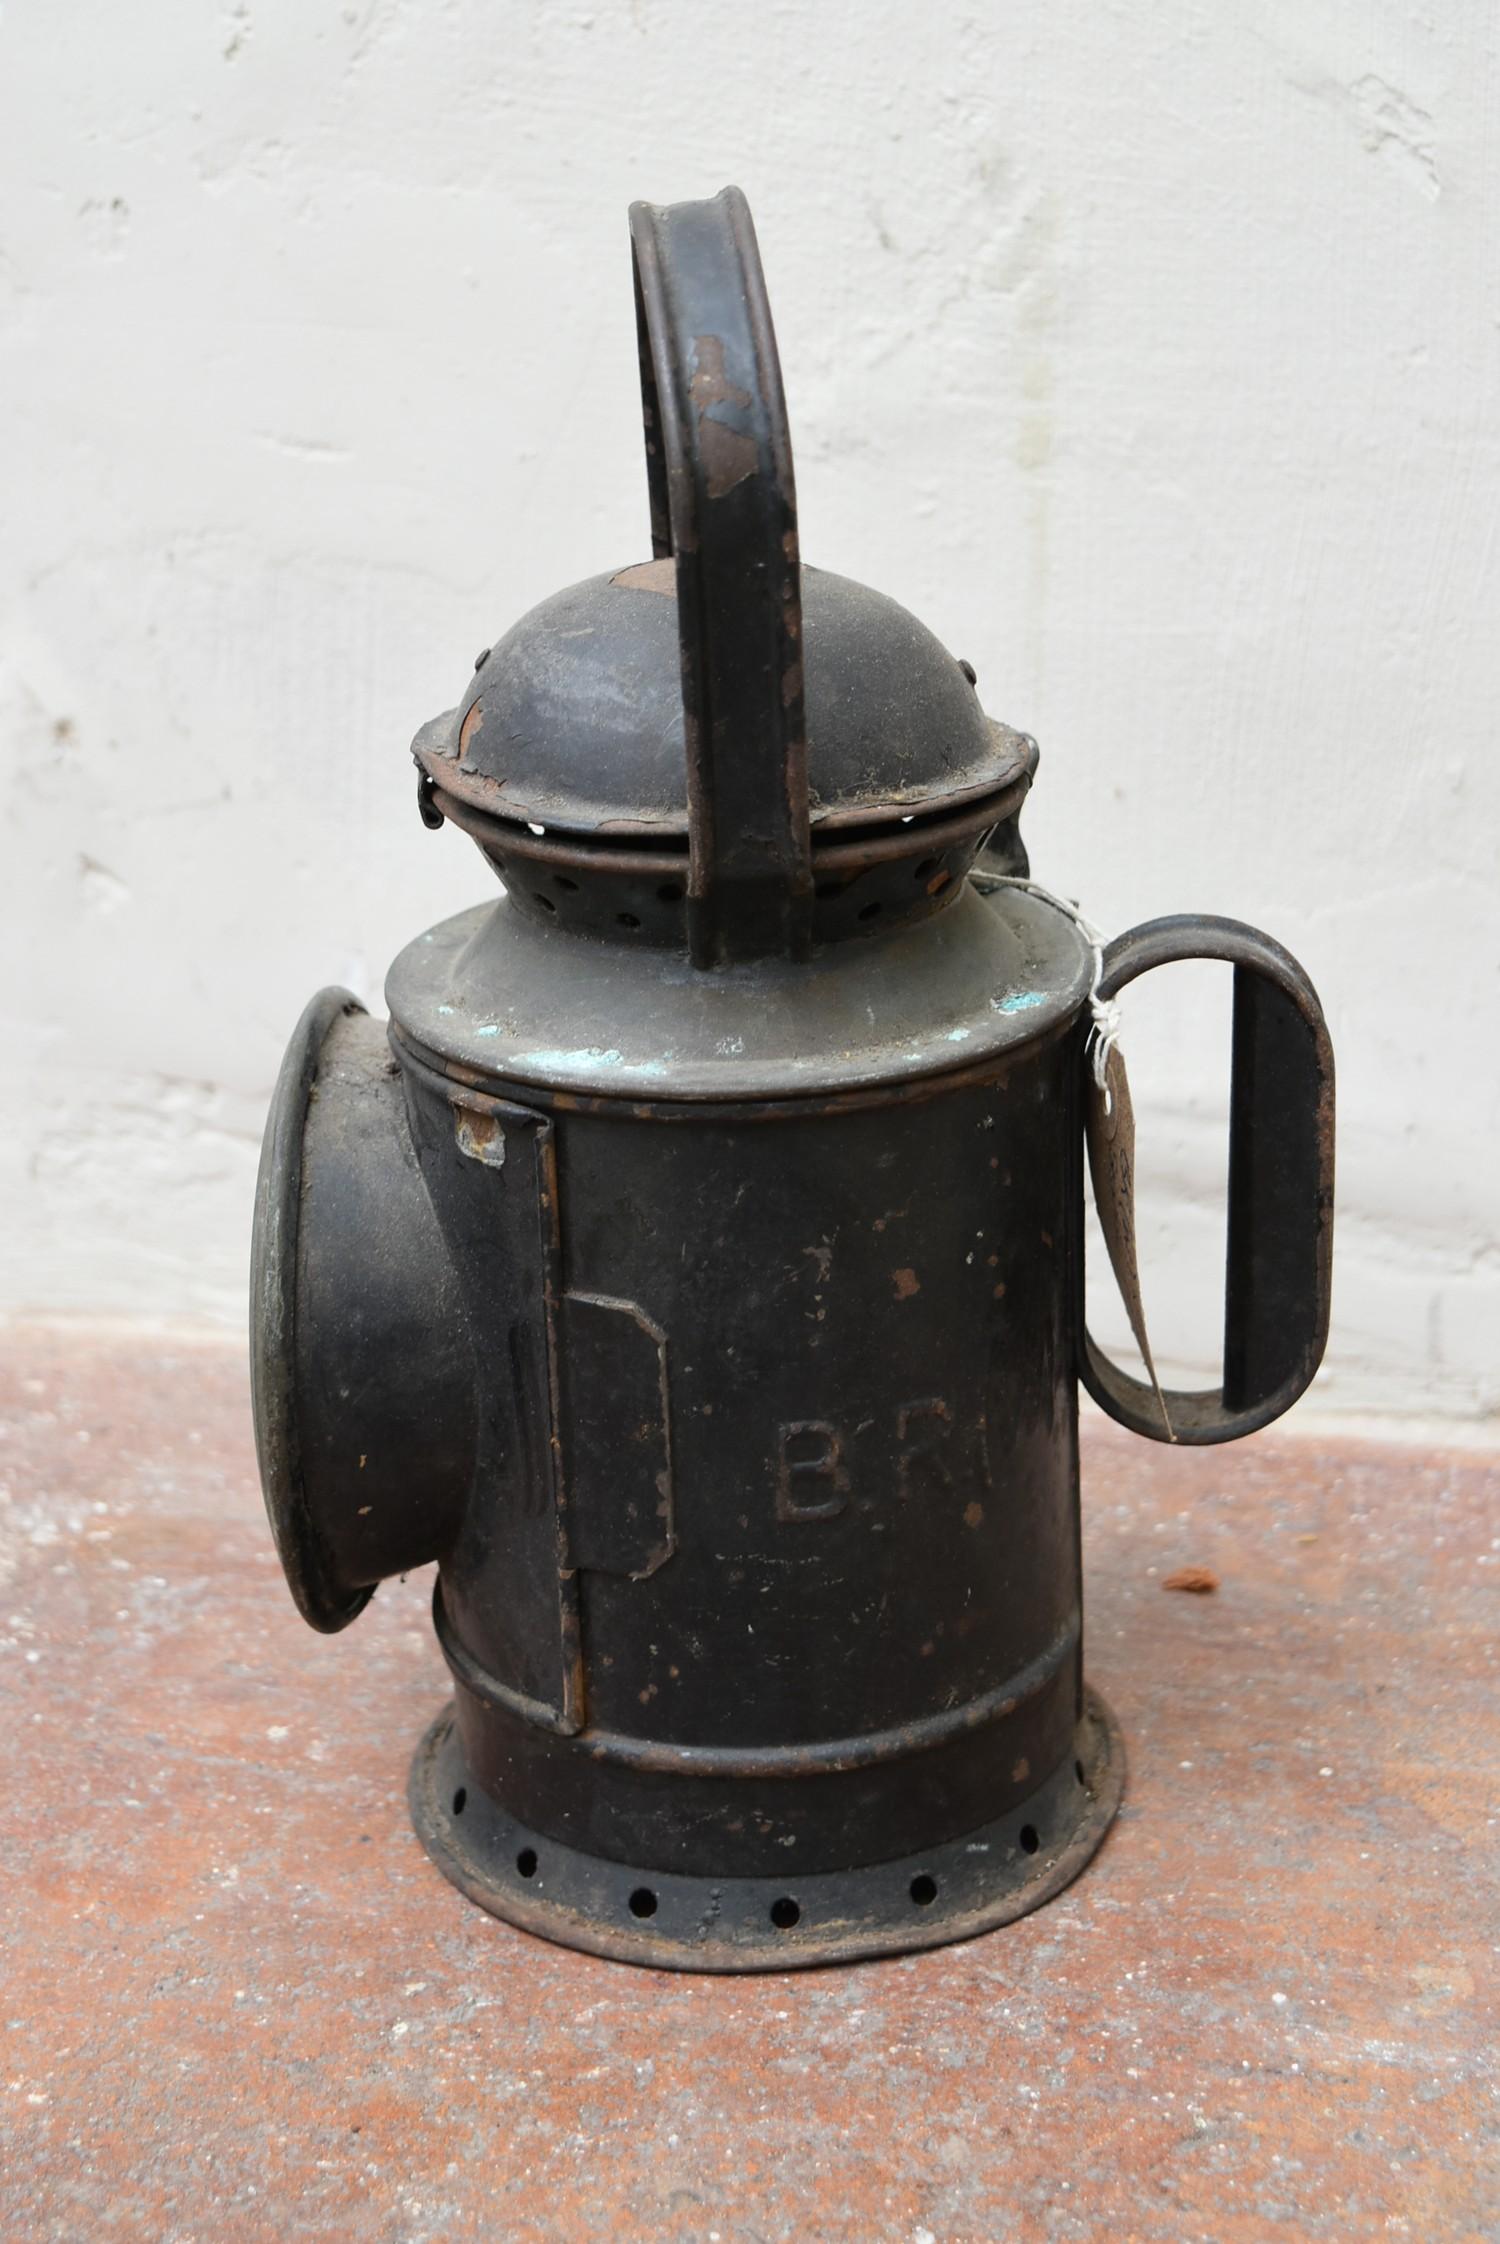 A vintage railwayman's metal cased signal lantern. H.32cm - Image 3 of 3